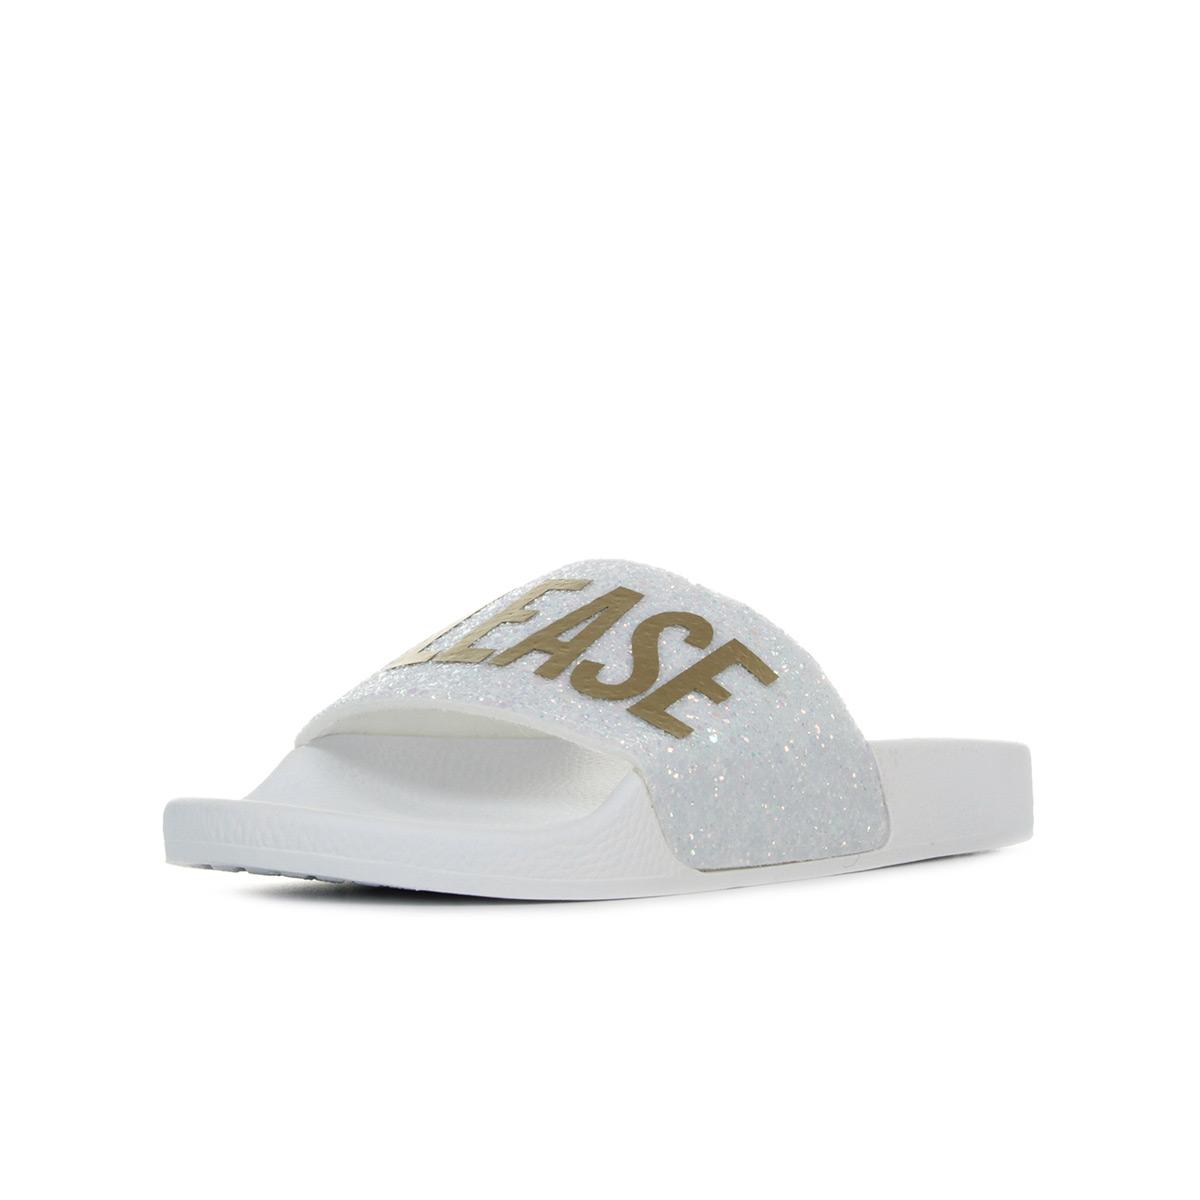 Thewhitebrand Glitter Beach Please blanc - Chaussures Sandale Femme